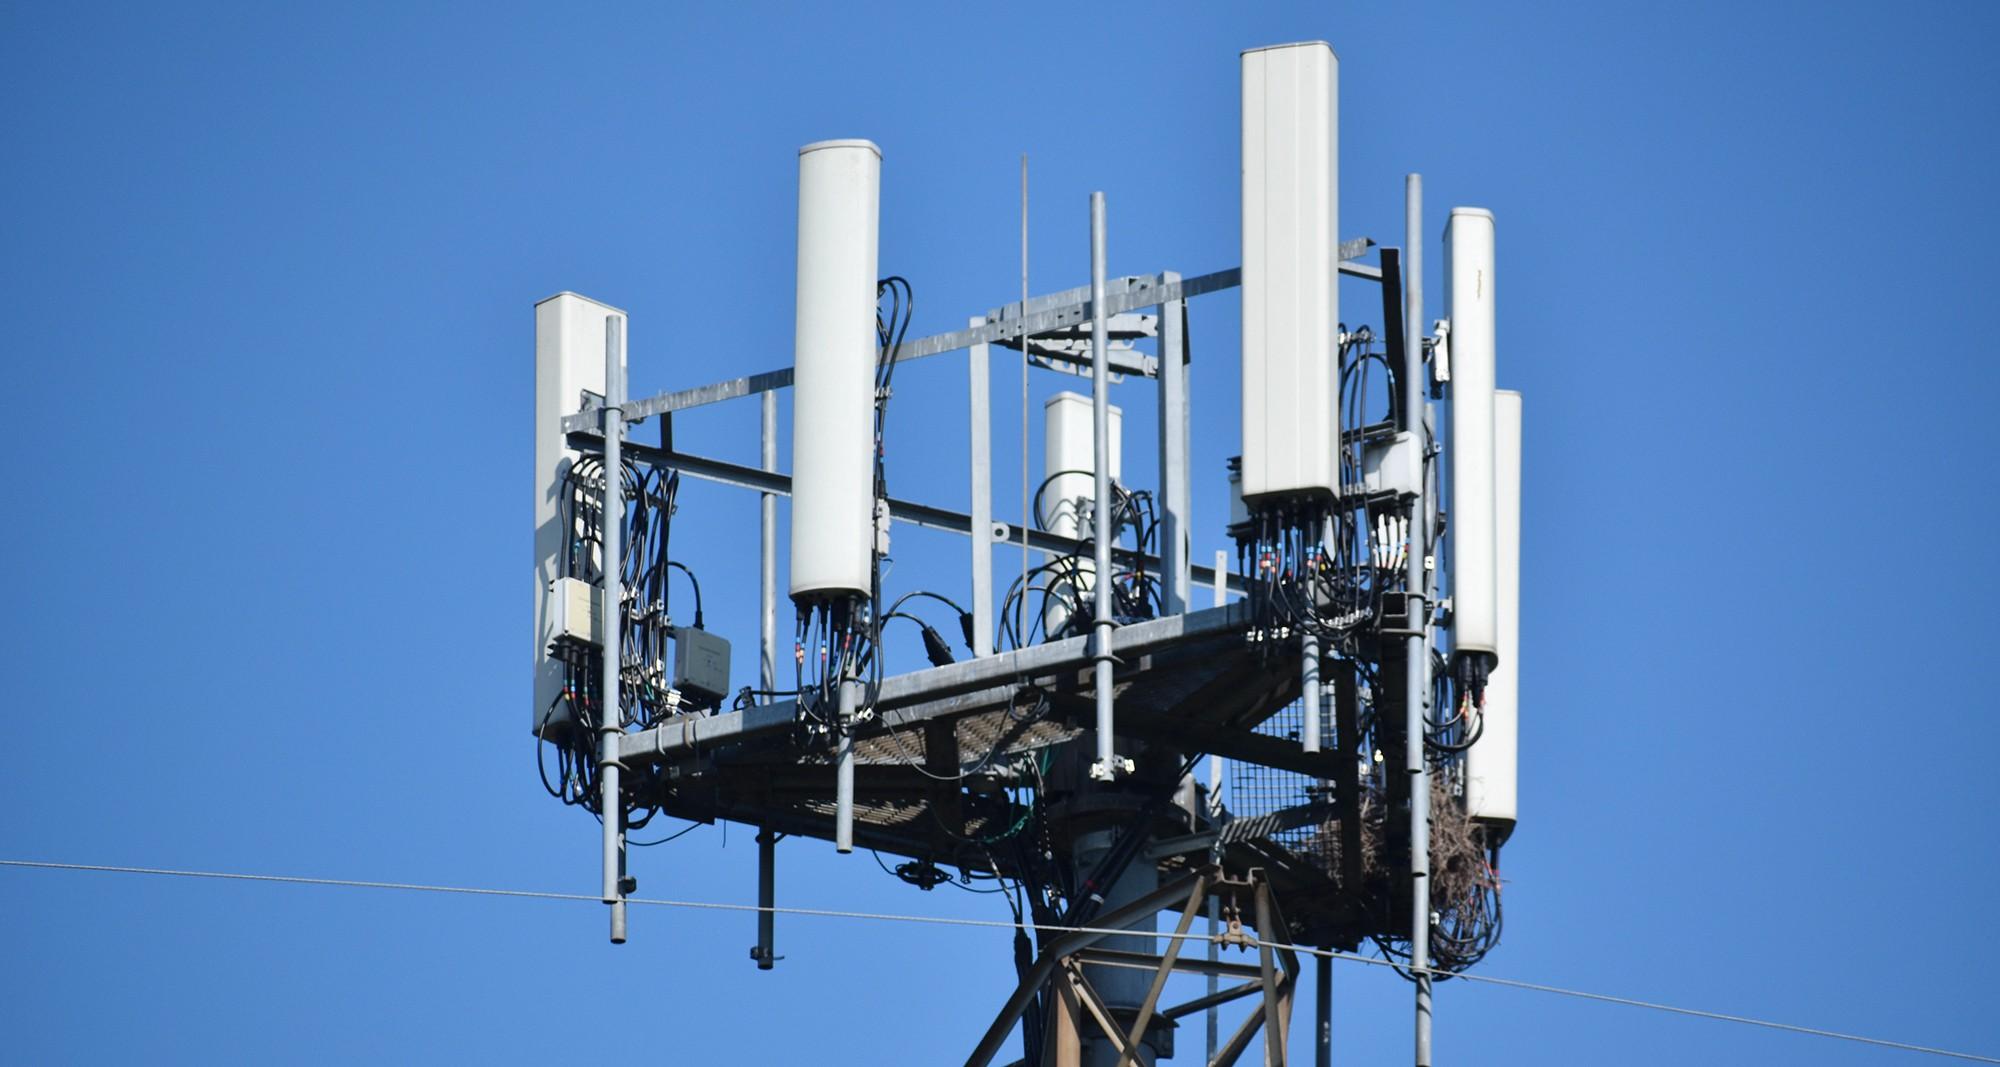 G5-Antenne